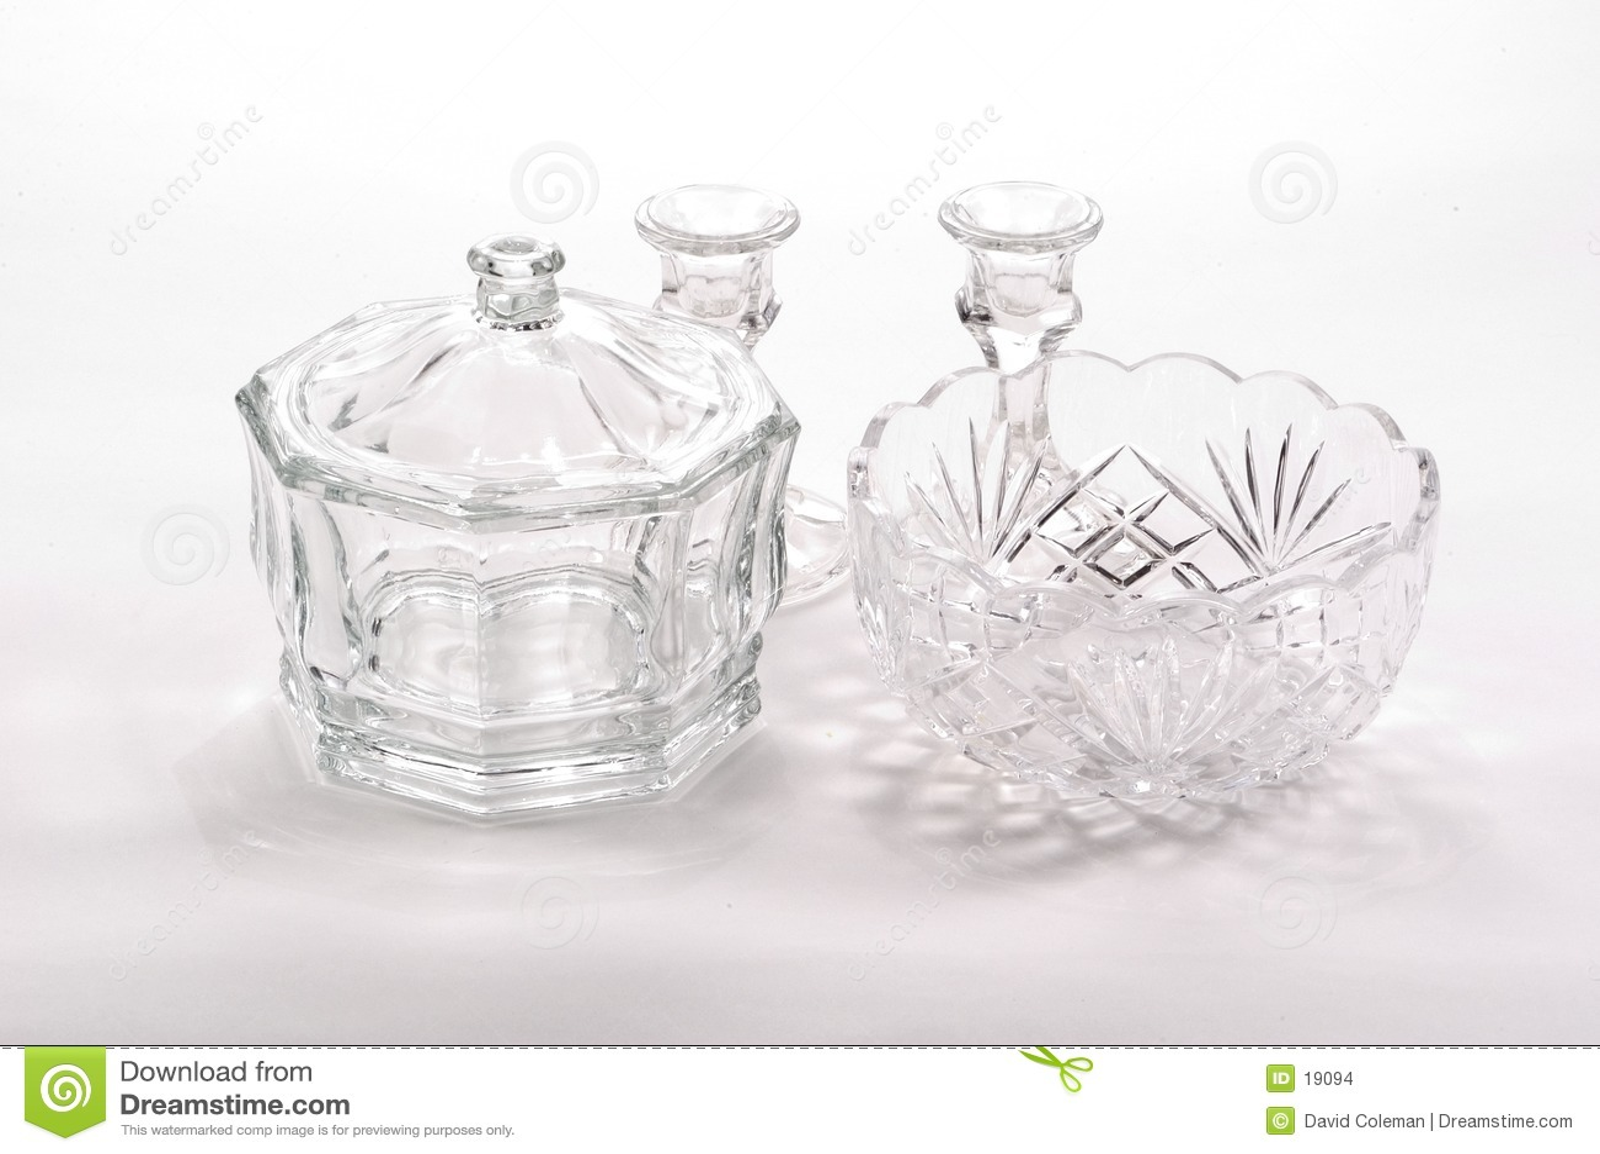 Cristal au plomb